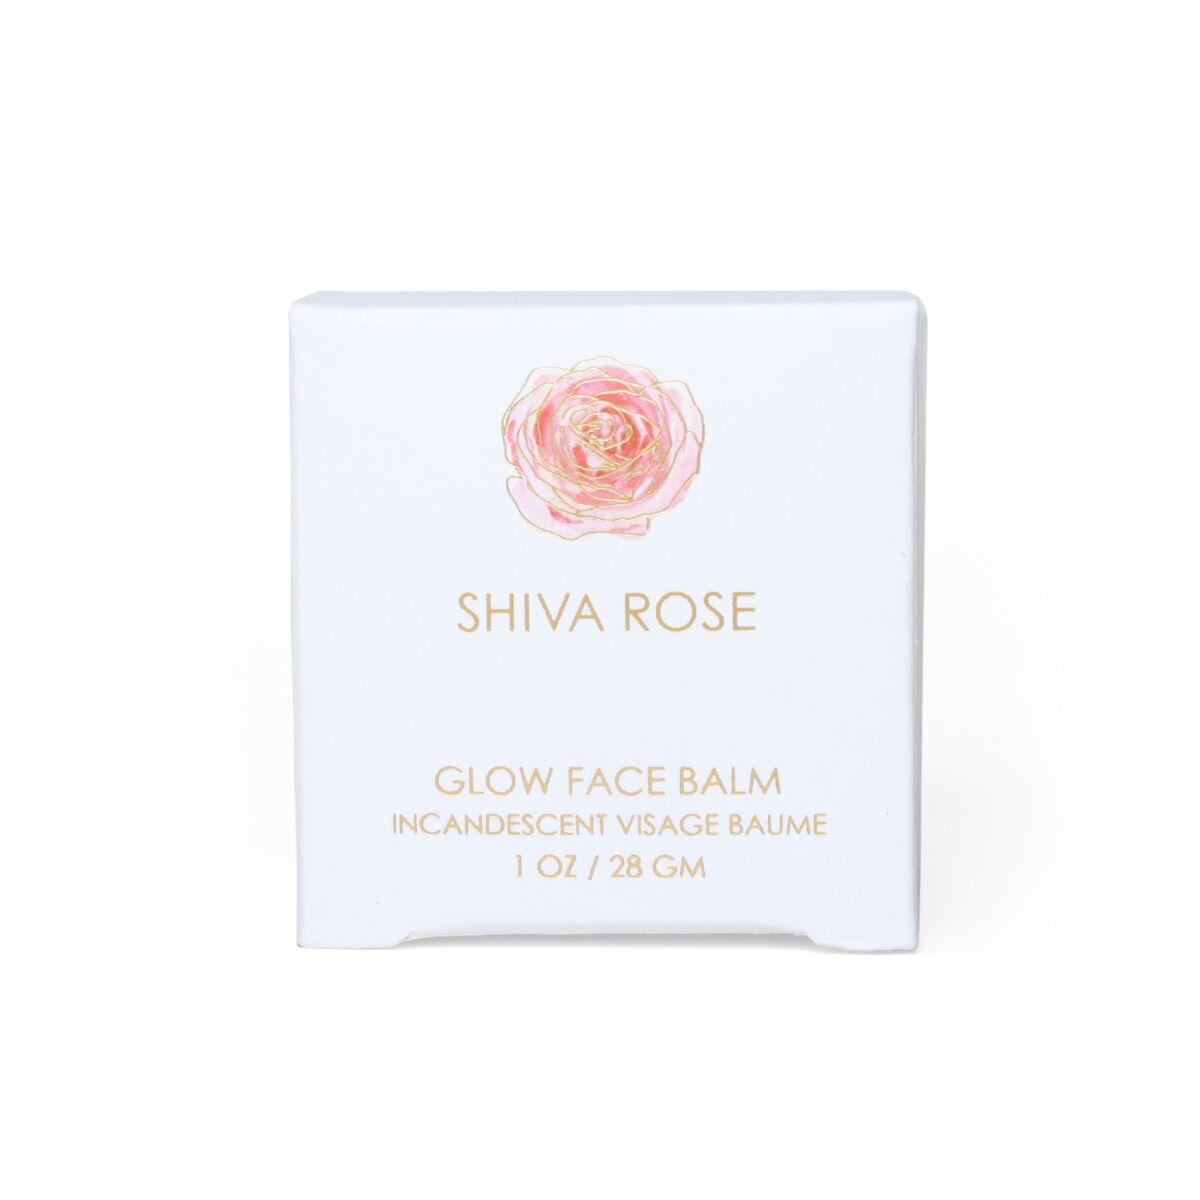 Shiva Rose Glow Face Balm image